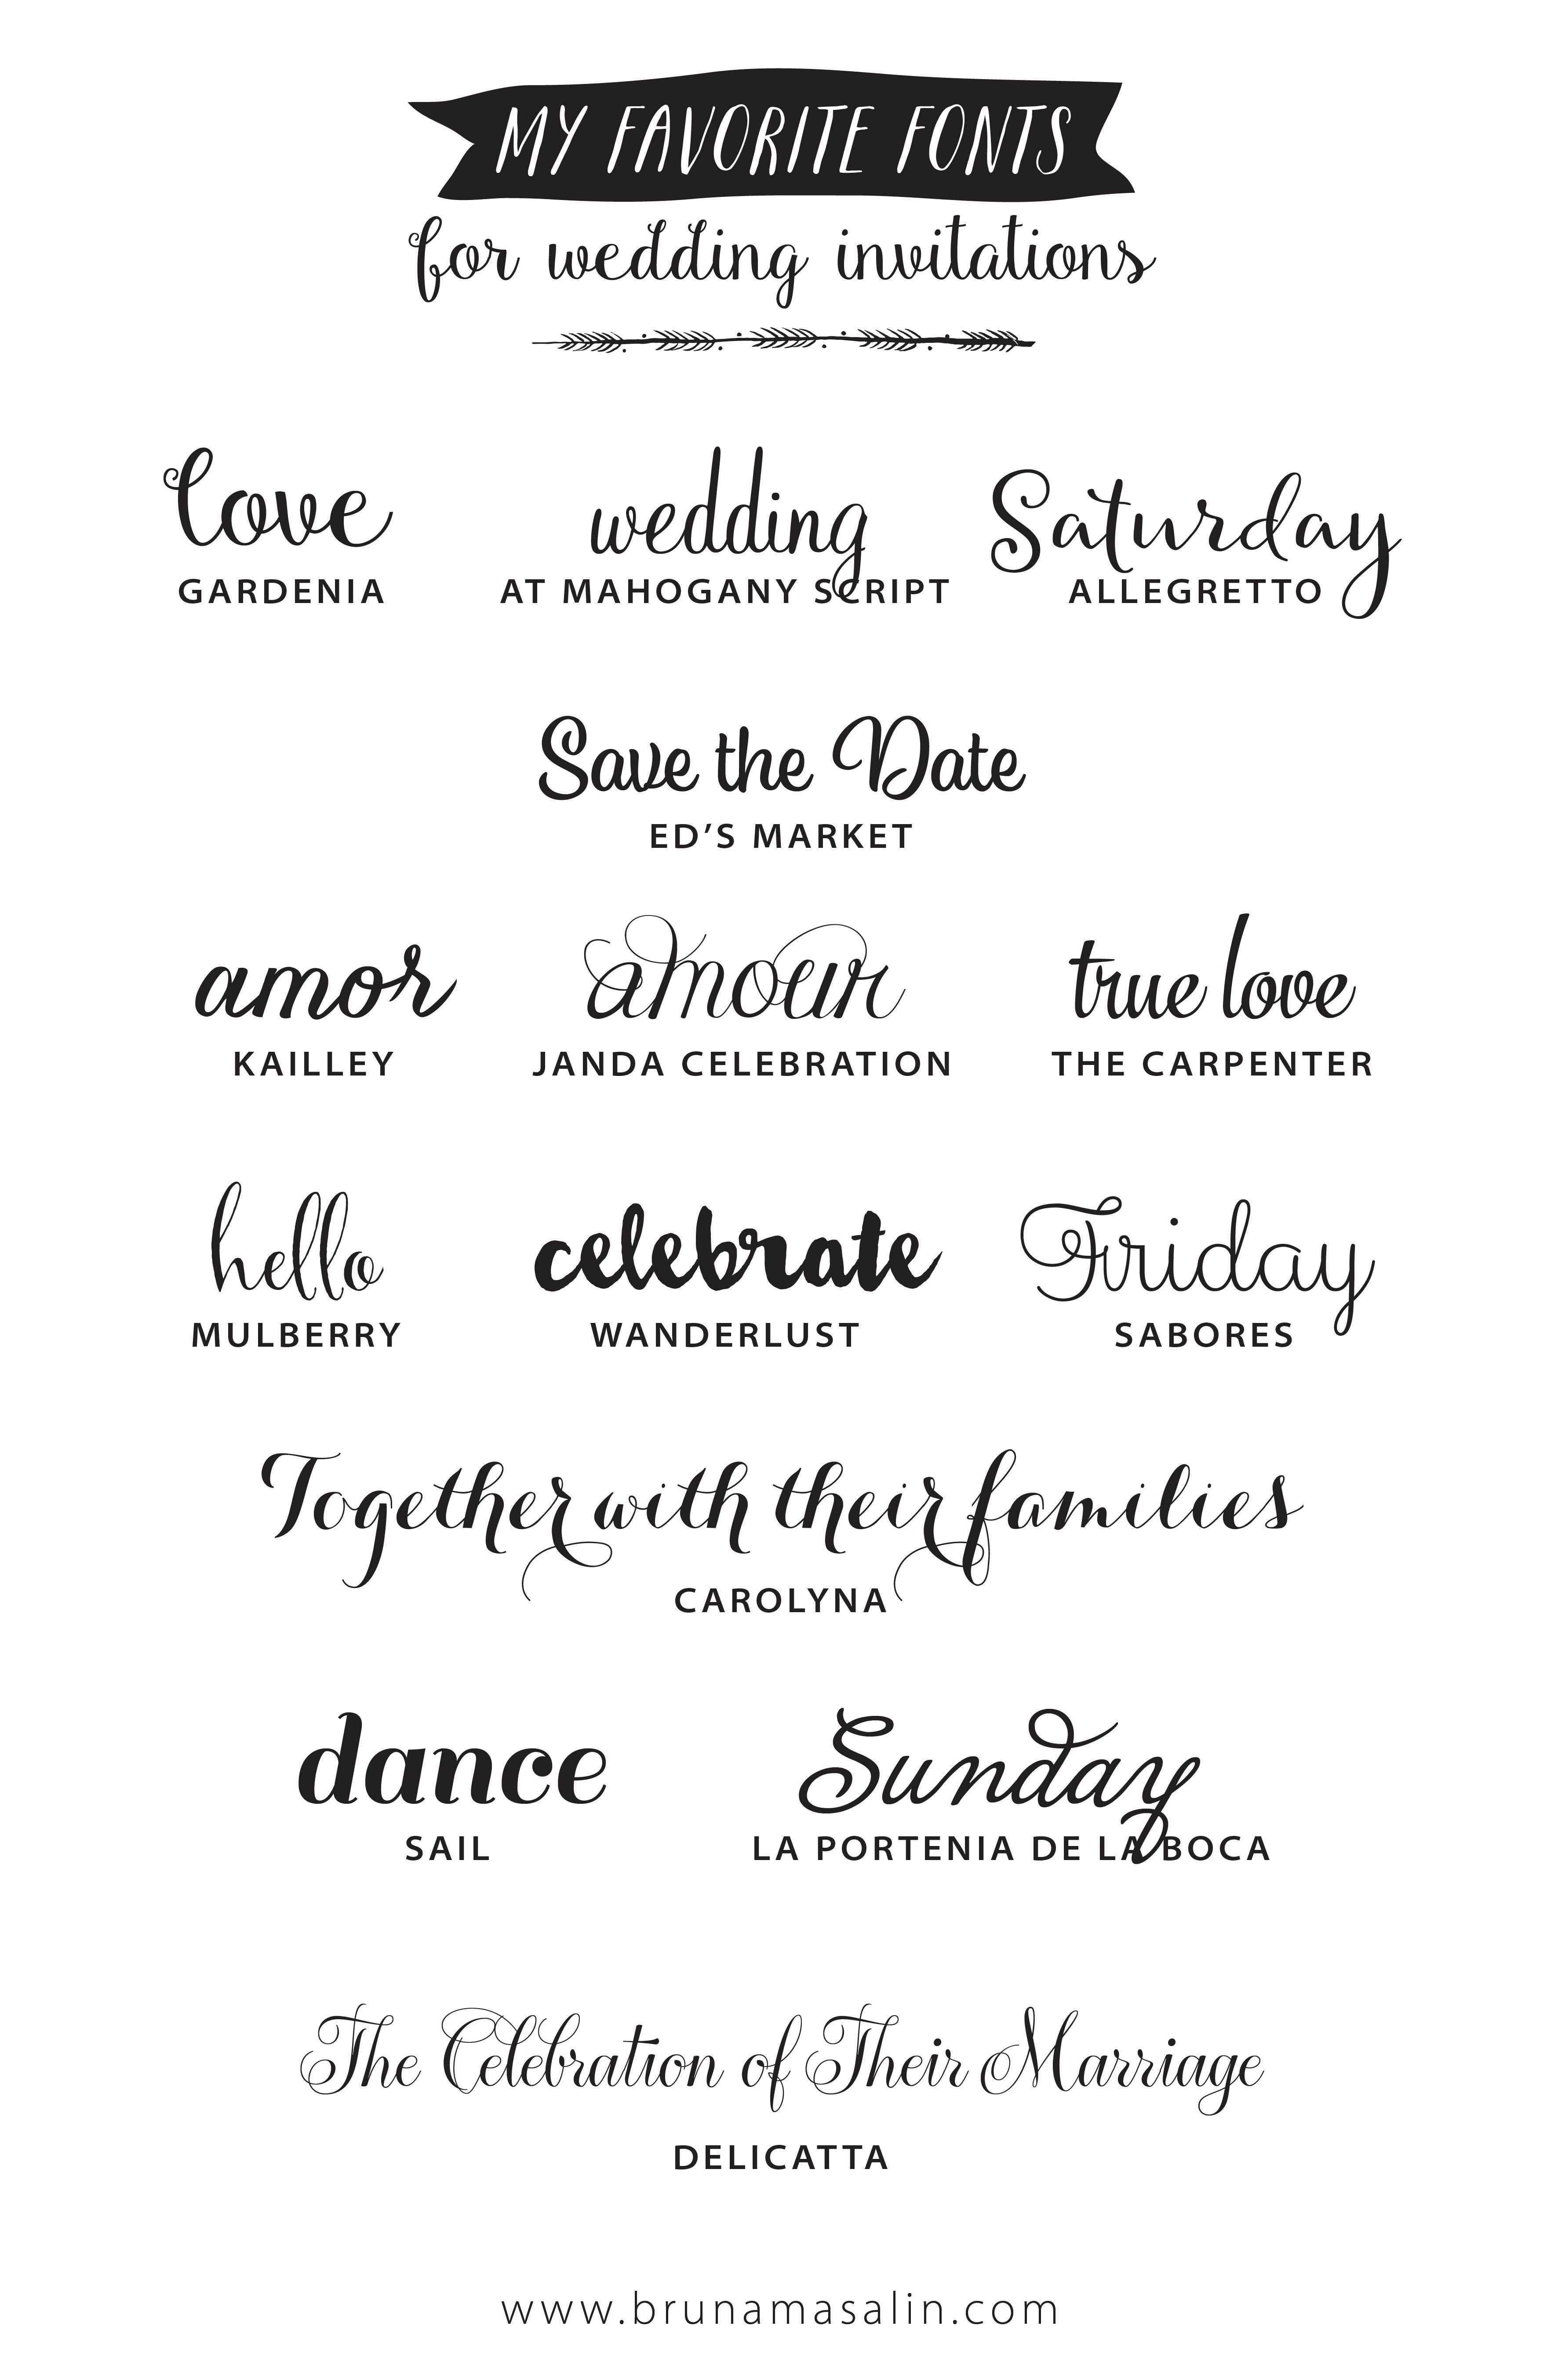 My Favorite Fonts For Wedding Invitations Wedding Invitation